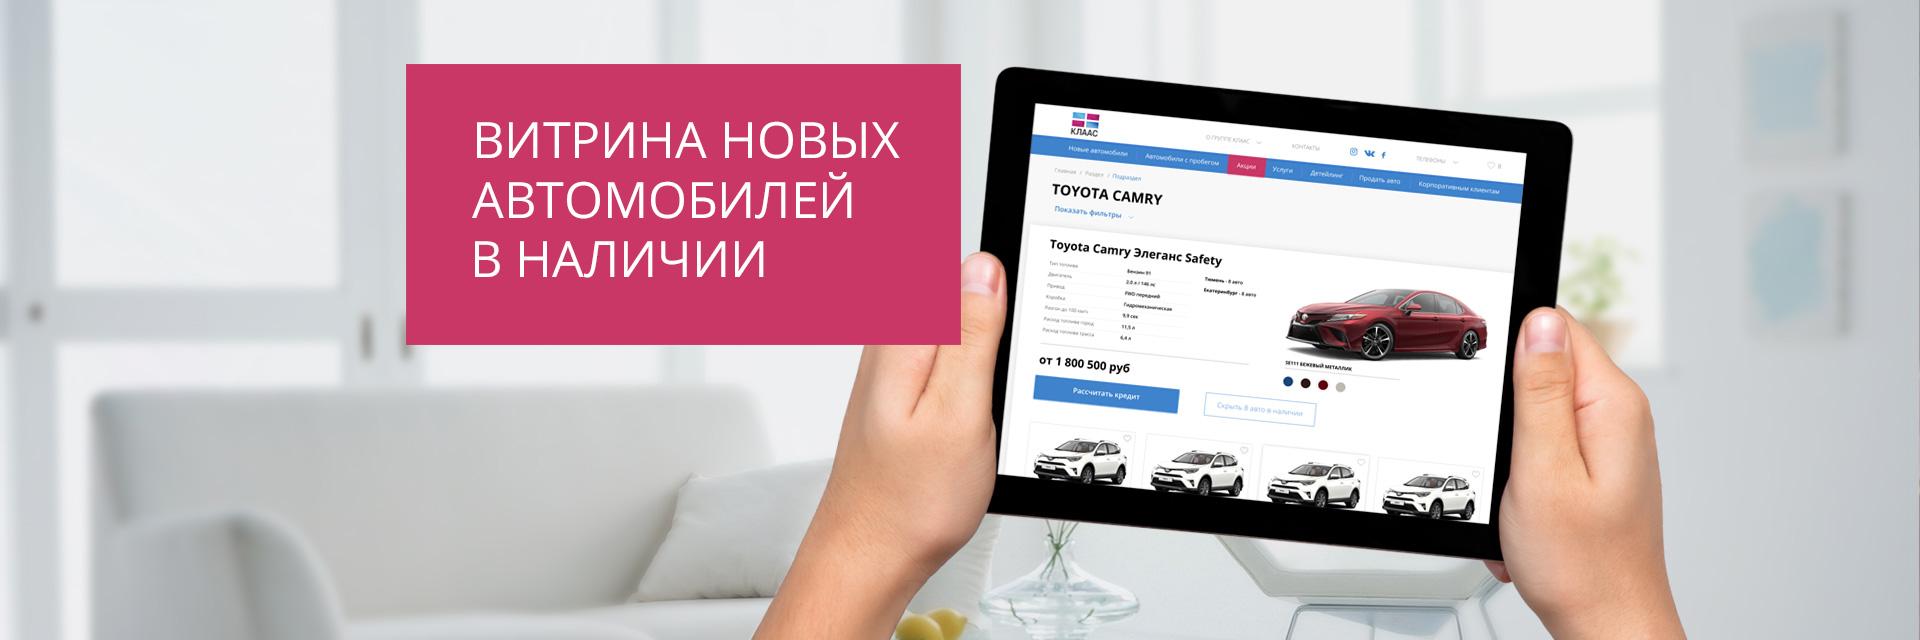 где взять 100 000 рублей срочно на карту